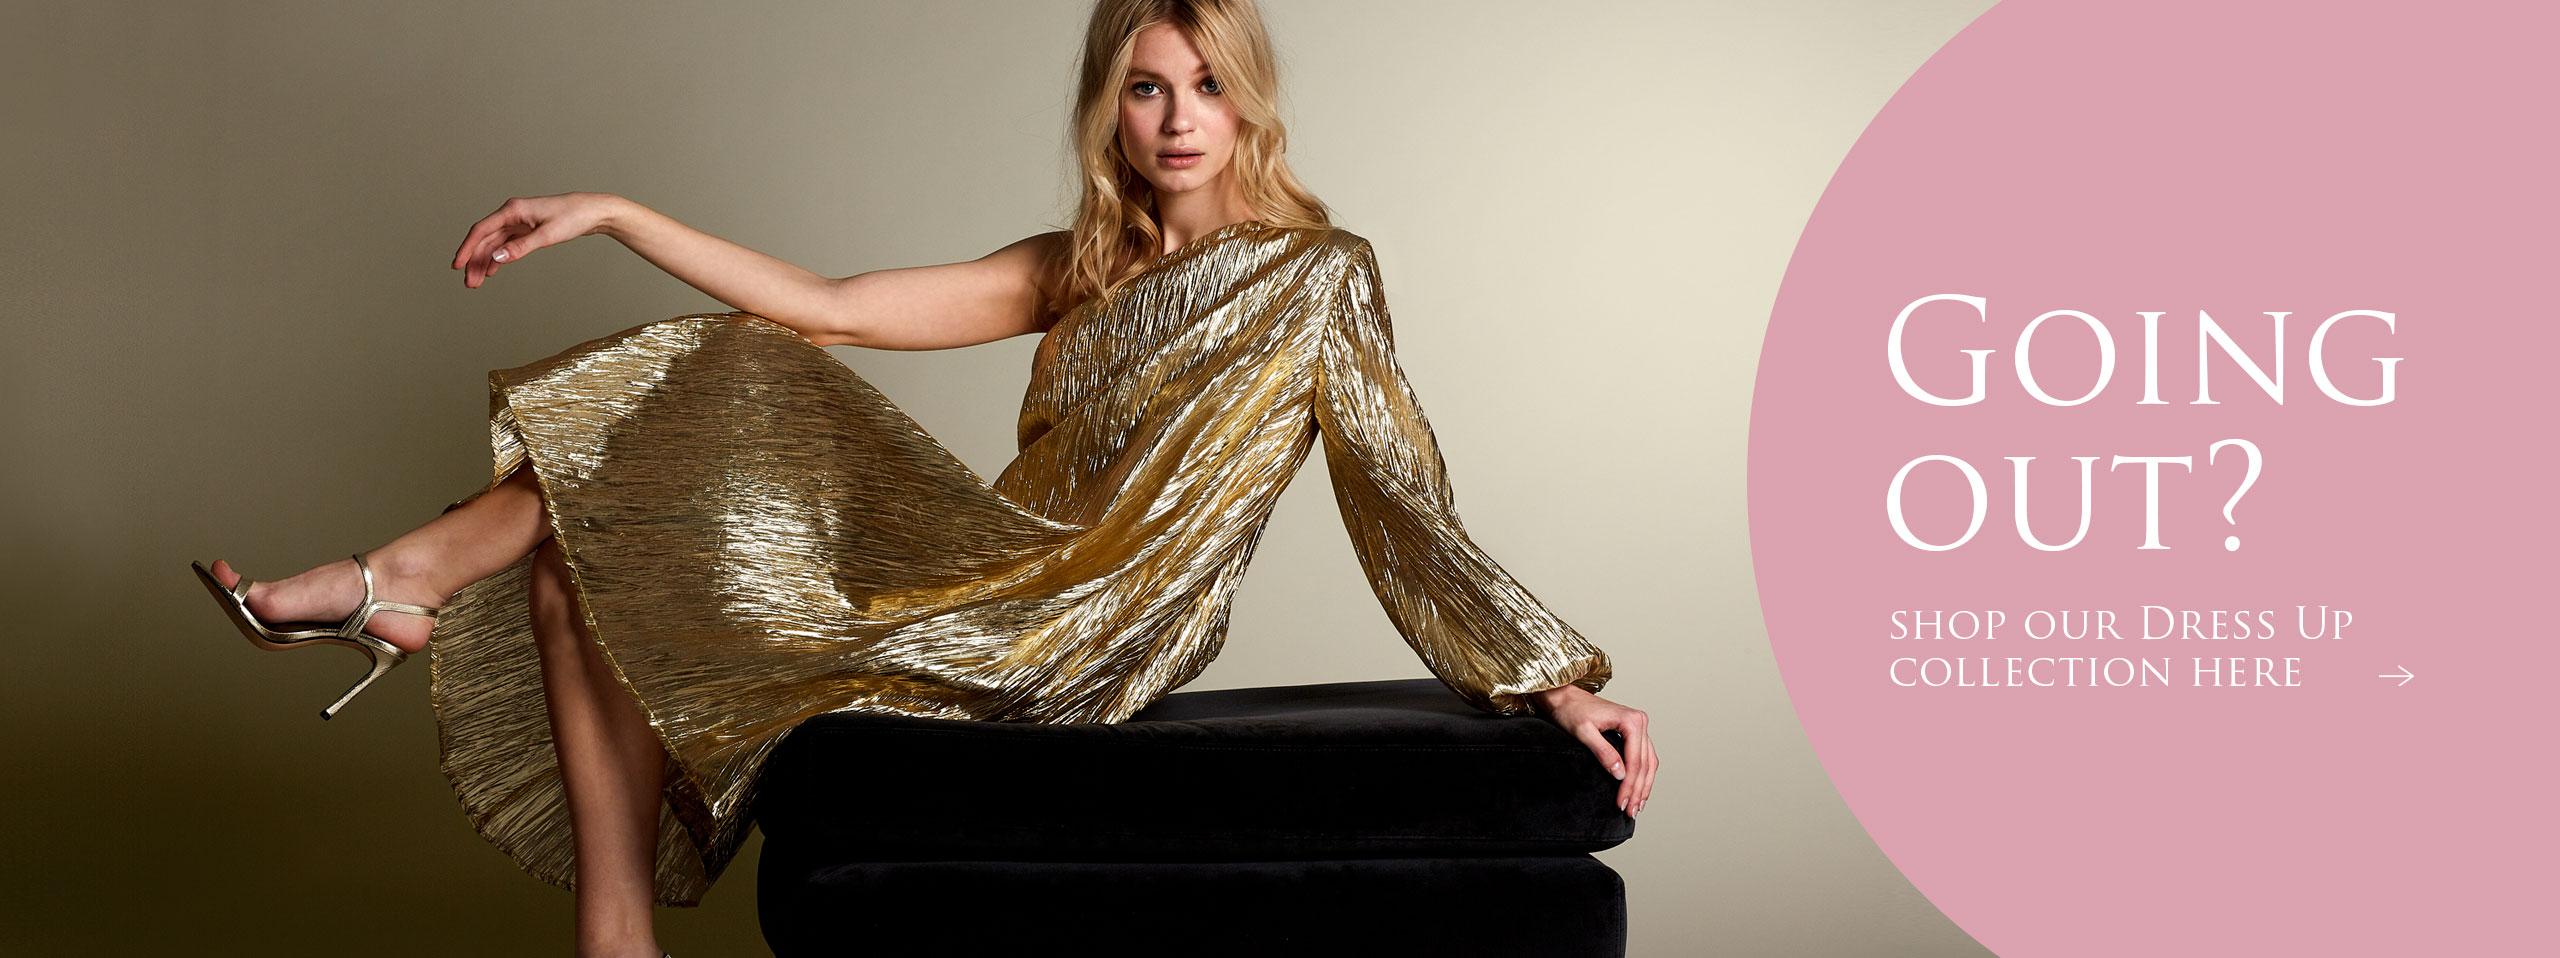 Gudnitz Copenhagen Dress Up Collection